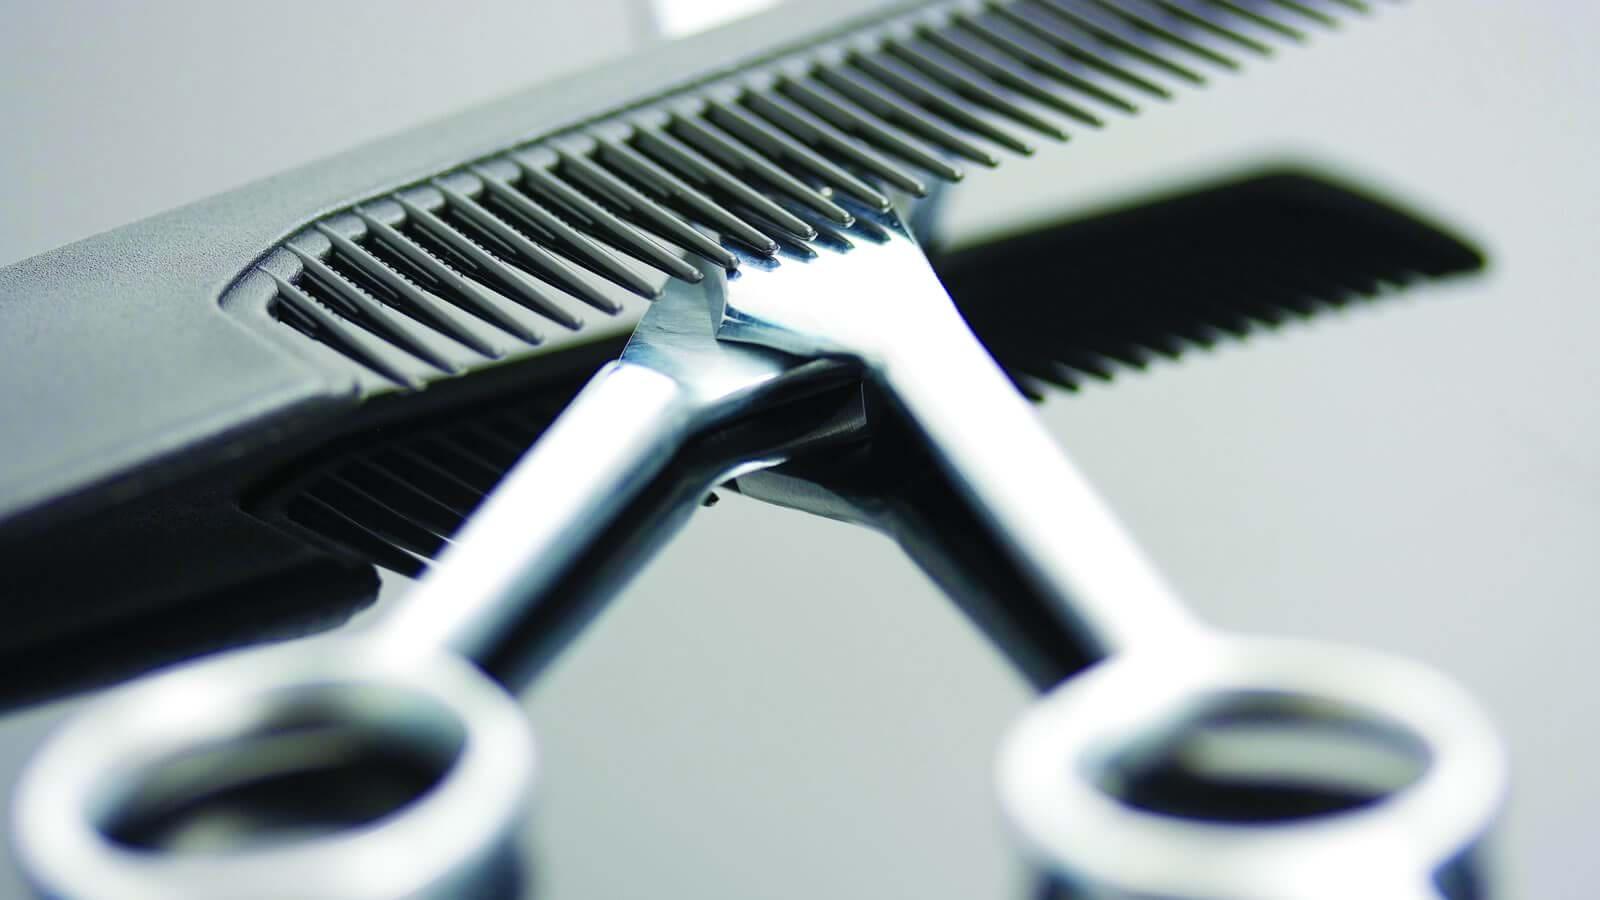 ... Template, Hair Salon Employment Application Template, Hair Stylist